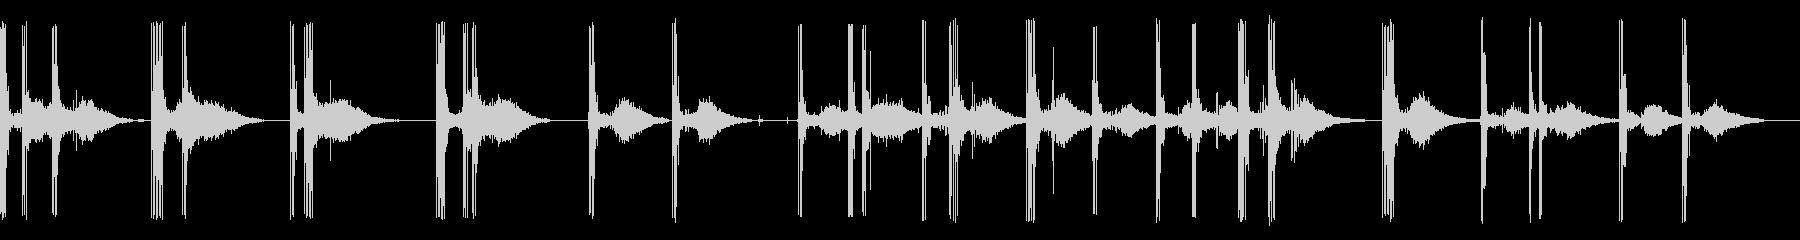 GIAT AA52 / ANF1、...の未再生の波形